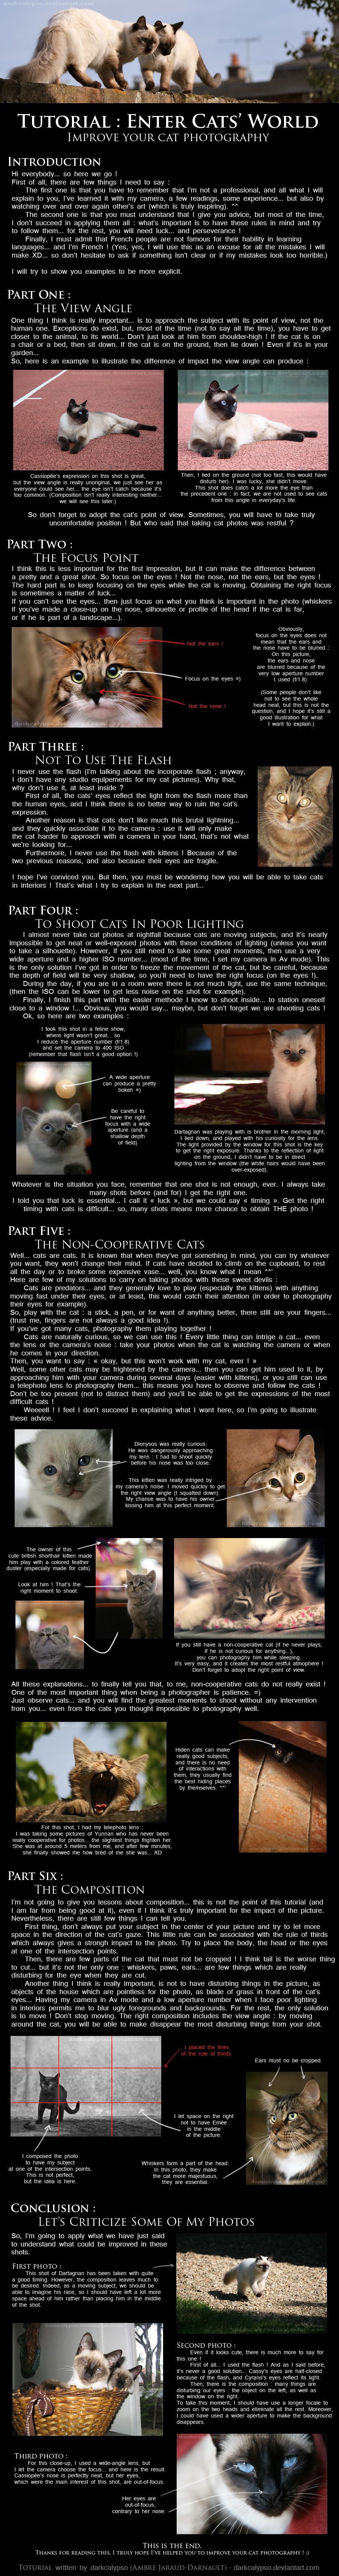 Tutorial : Enter Cats' World by darkcalypso